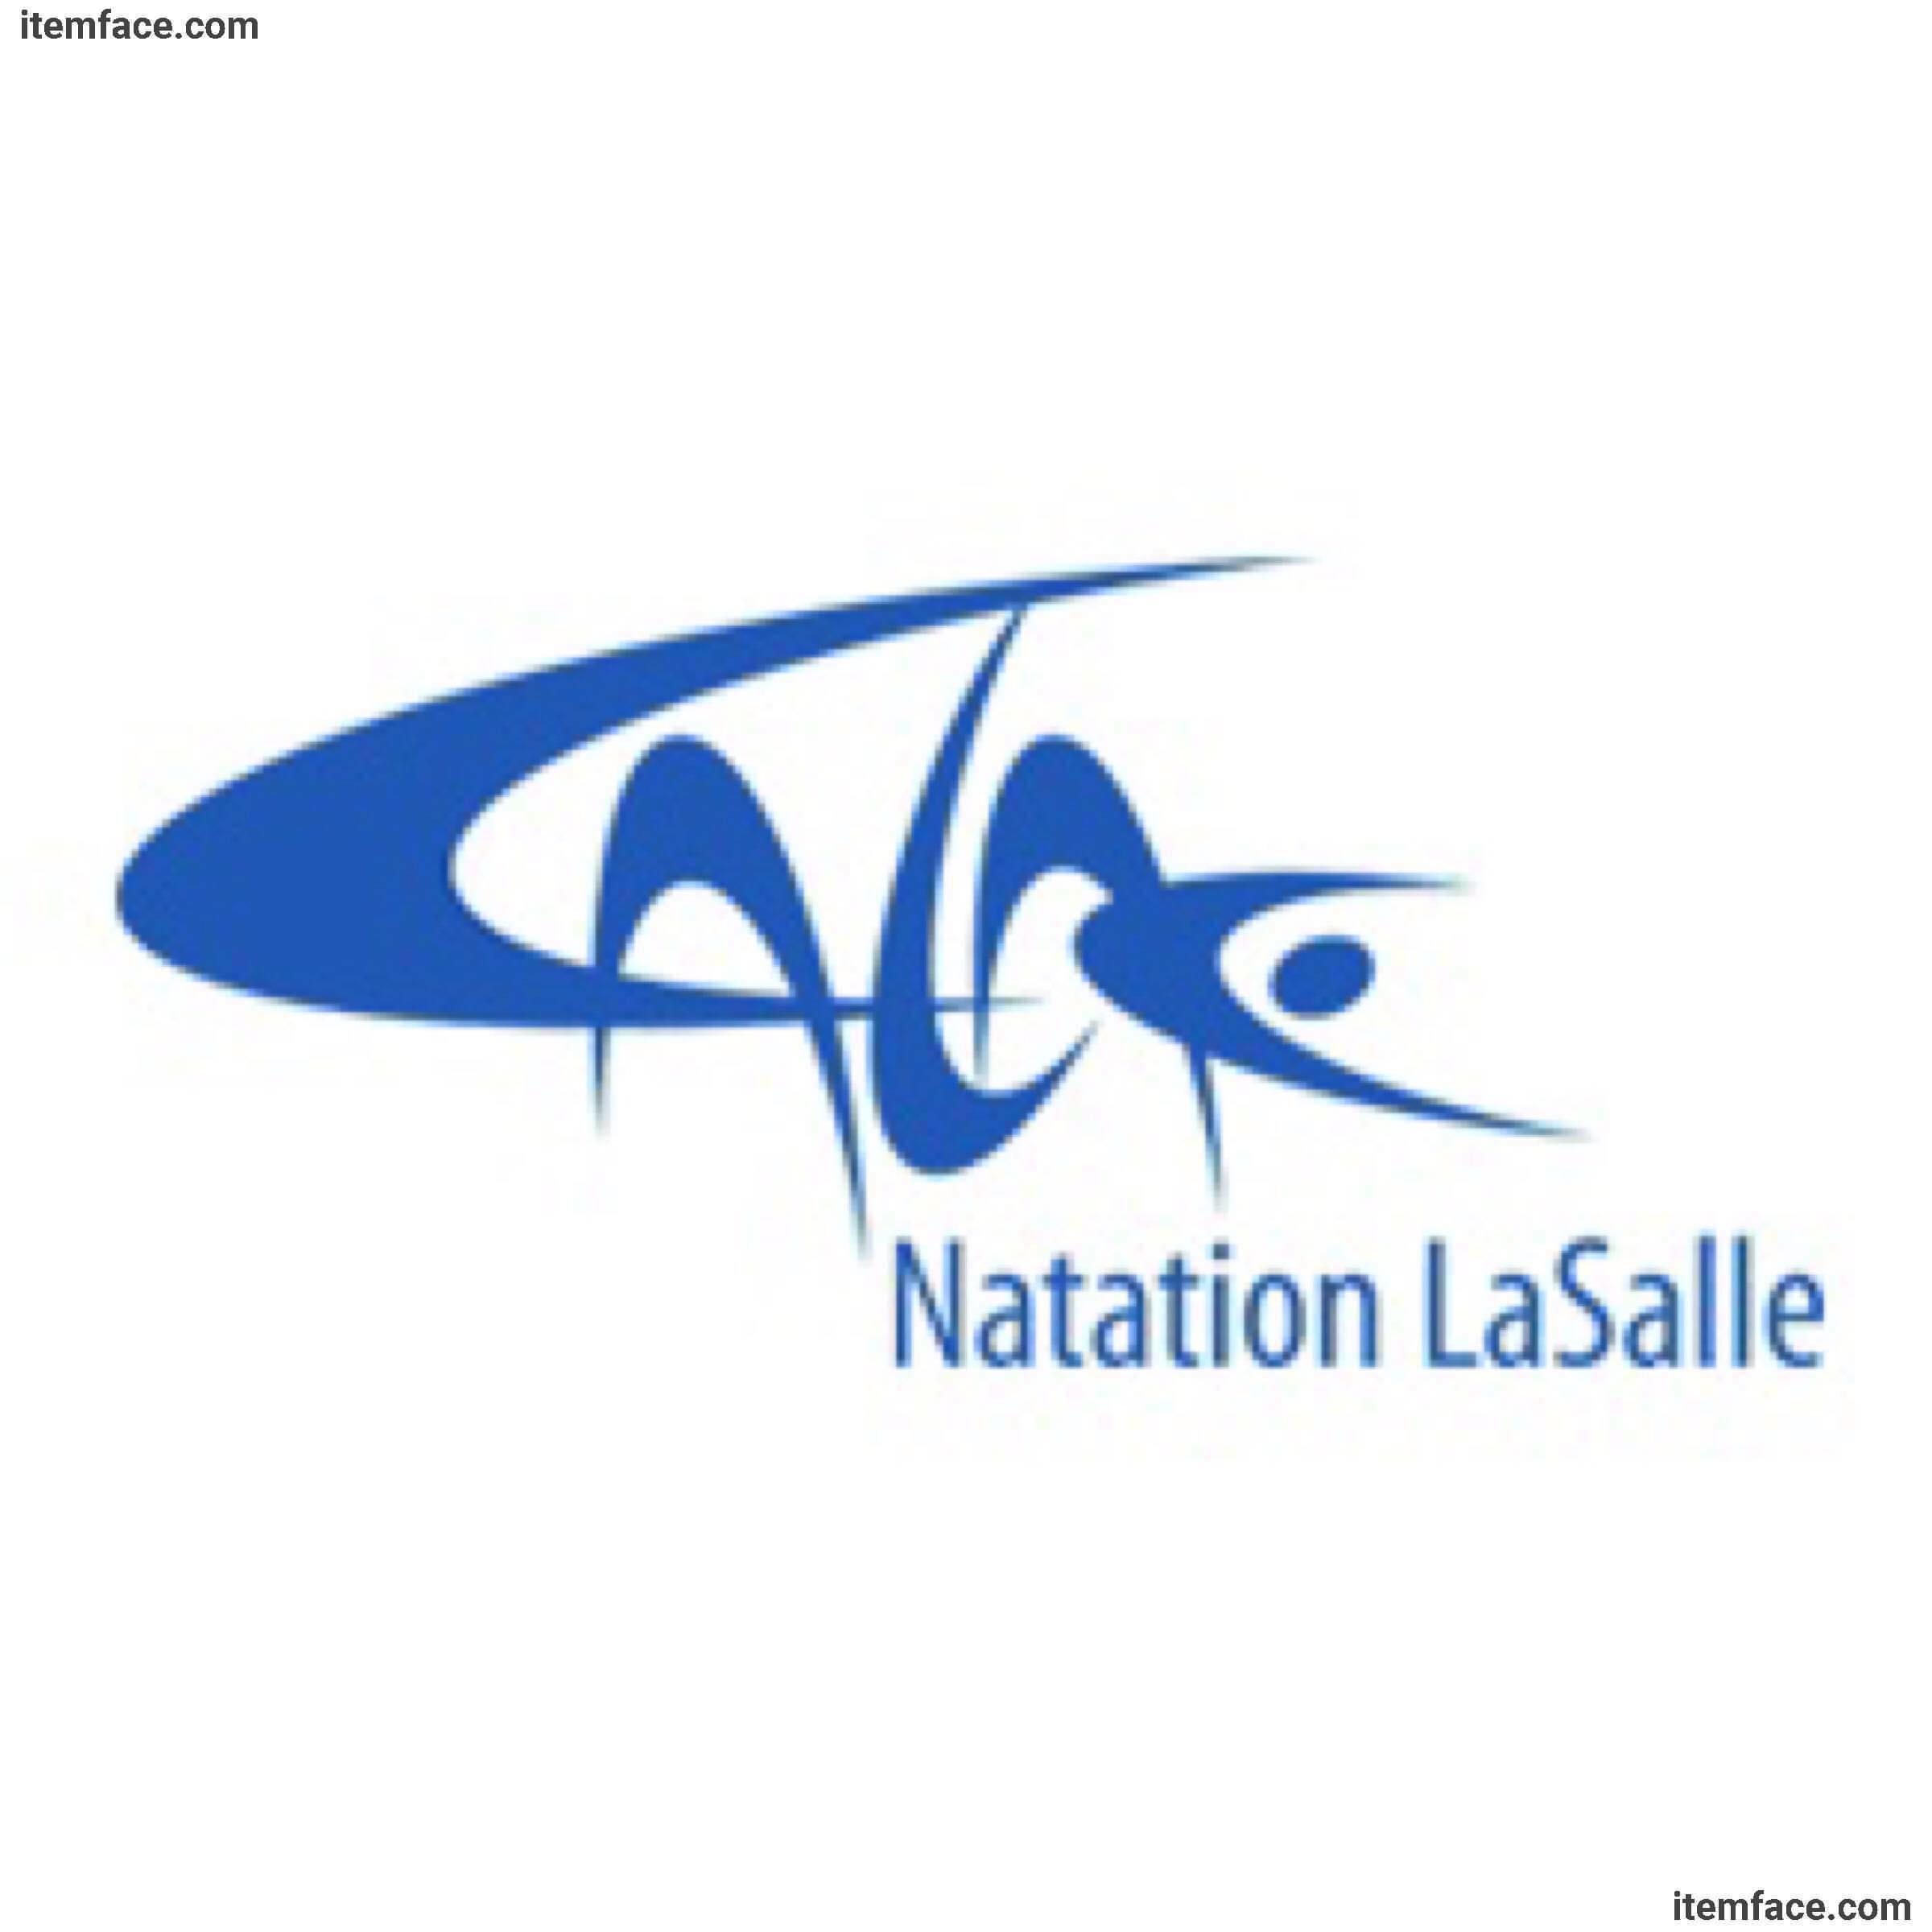 Club de Natation LaSalle (CALAC) - Sports Club